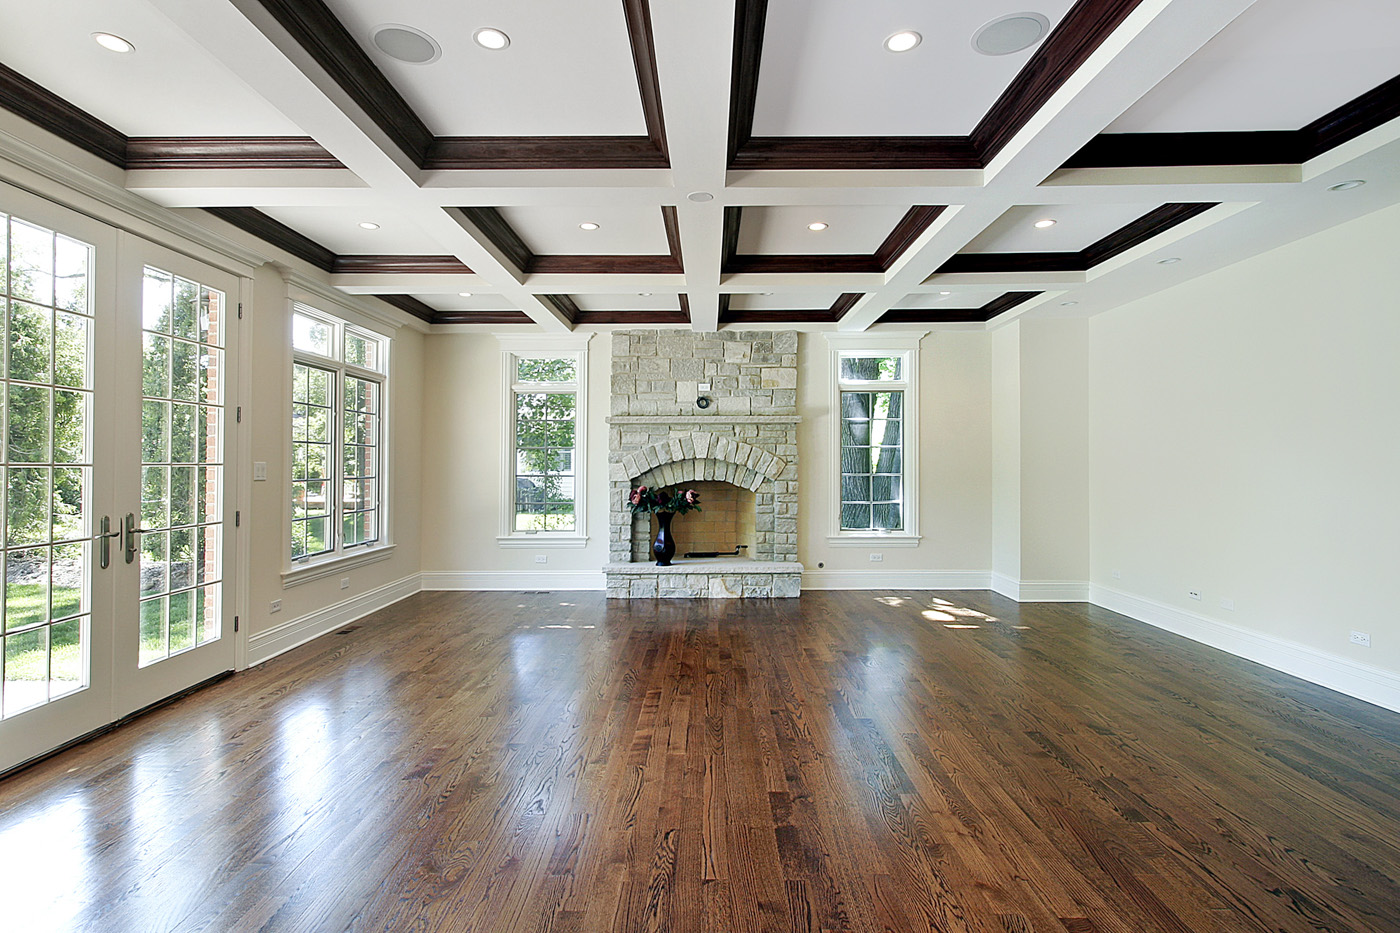 hardwood-floor-refinishing-chicago-laminate-wood-flooring-chicago